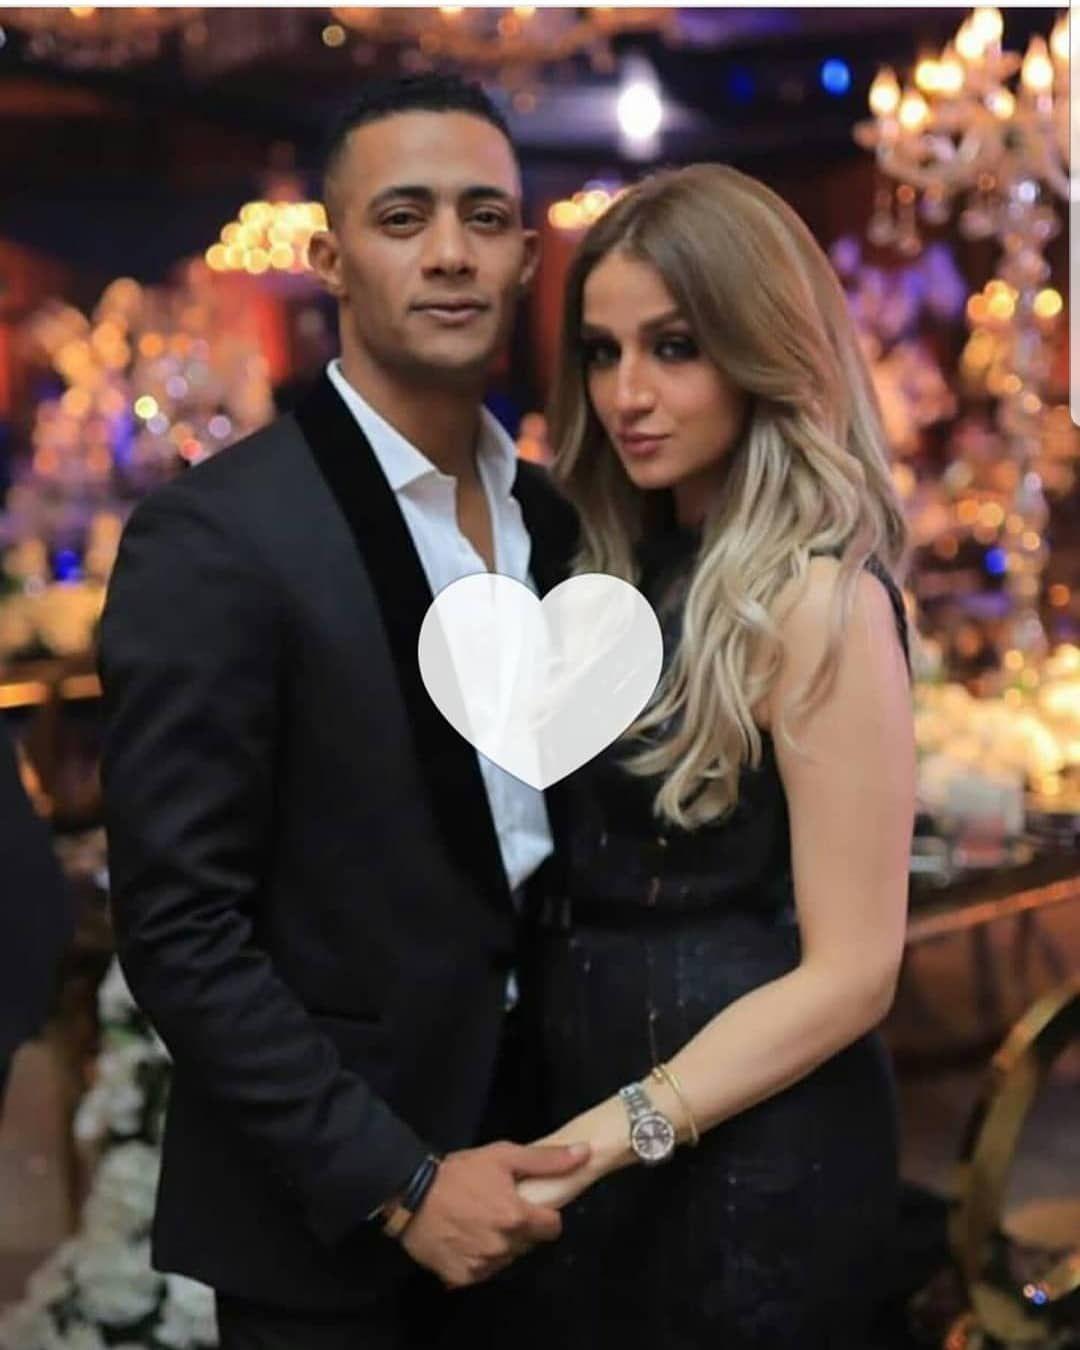 Egypt Celebrity On Instagram محمد رمضان وزوجته من حفل زفاف شيماء سيف Celebrities Couple Photos Couples